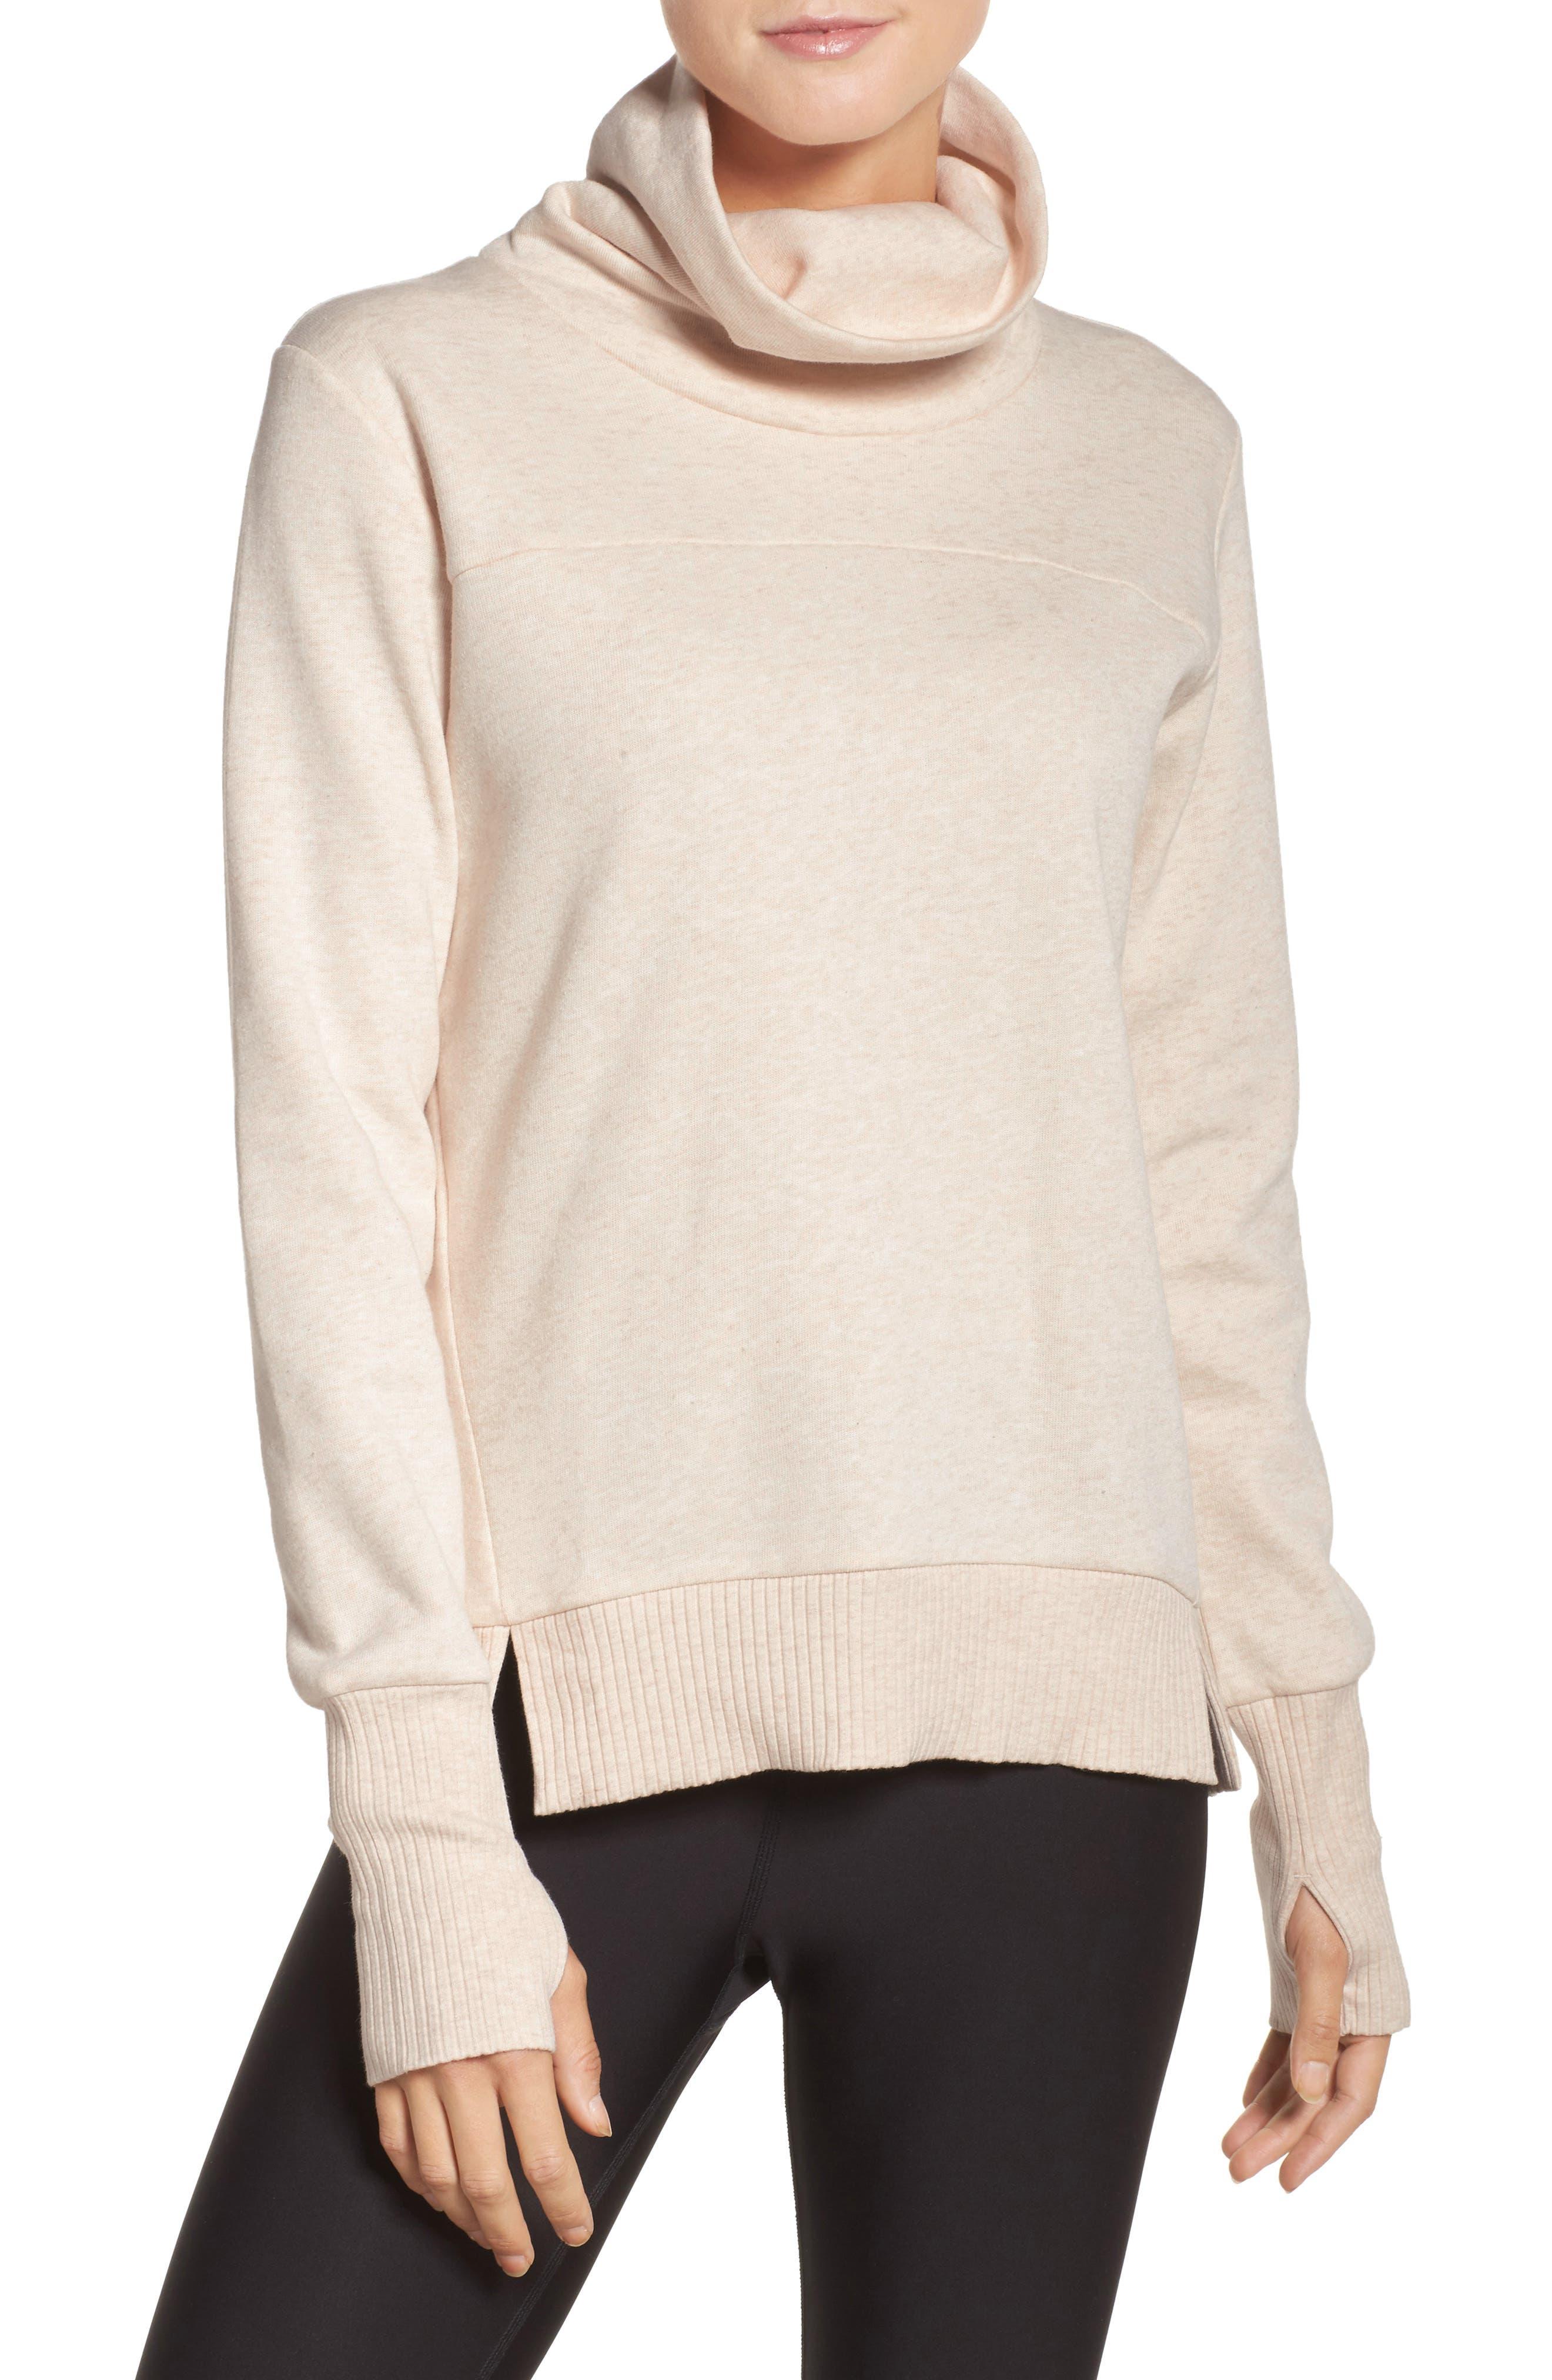 'Haze' Funnel Neck Sweatshirt, Main, color, PRISTINE HEATHER